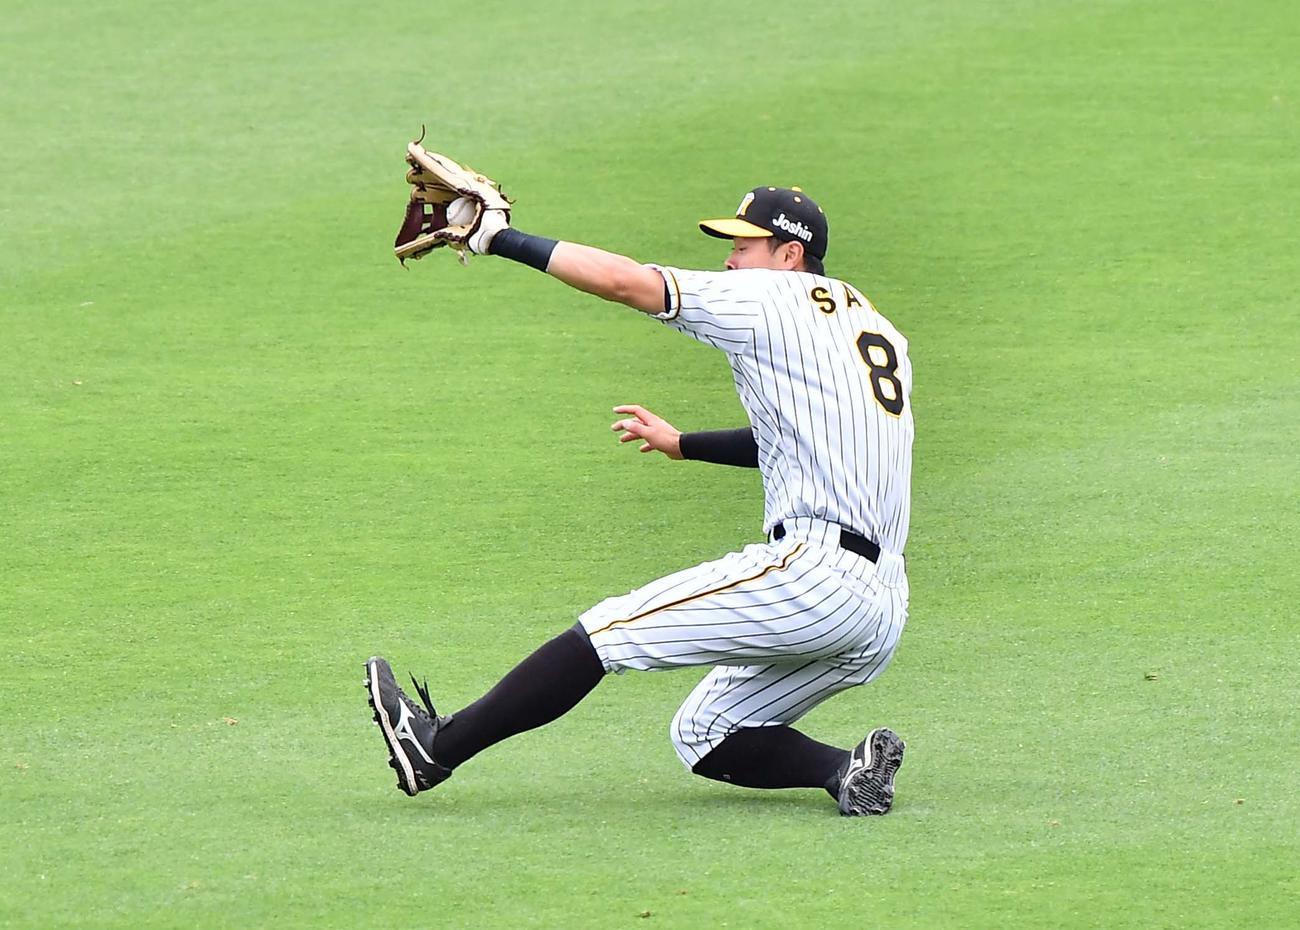 阪神対巨人 1回表巨人2死一、二塁、中島宏之の右飛を好捕する佐藤輝(撮影・上田博志)